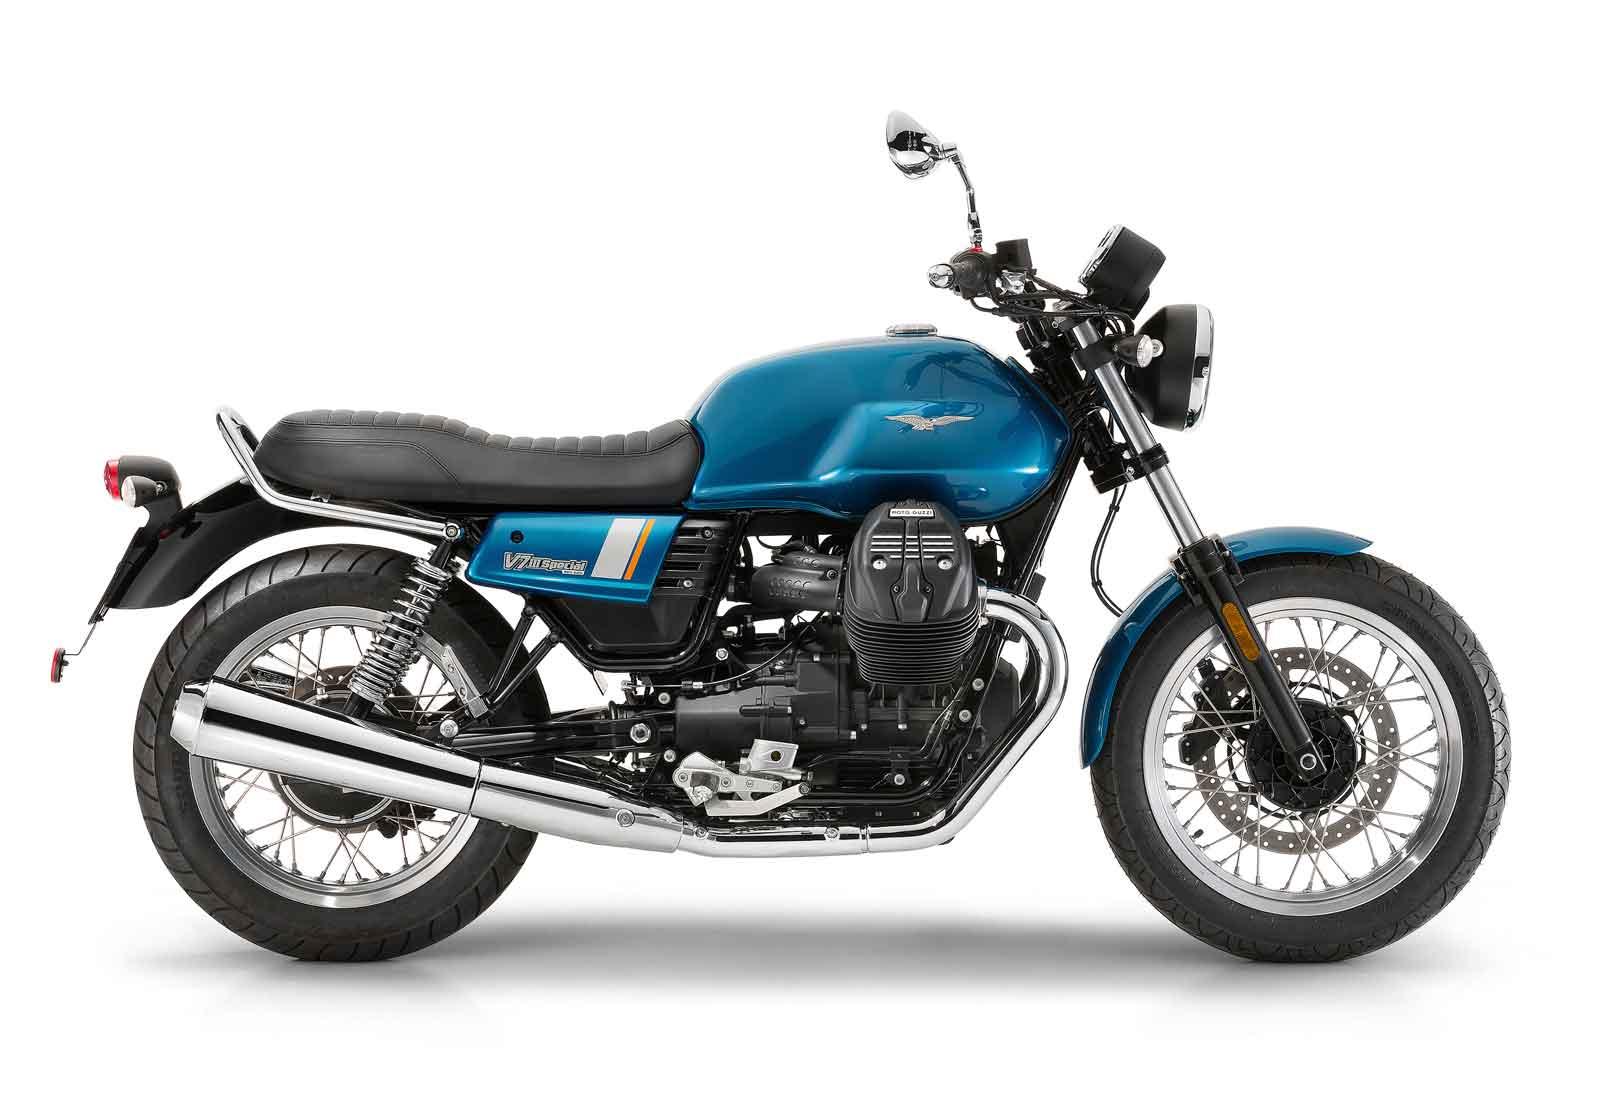 Moto de perfil, modelo Special, color azul zaffiro. Marca Motoguzzi